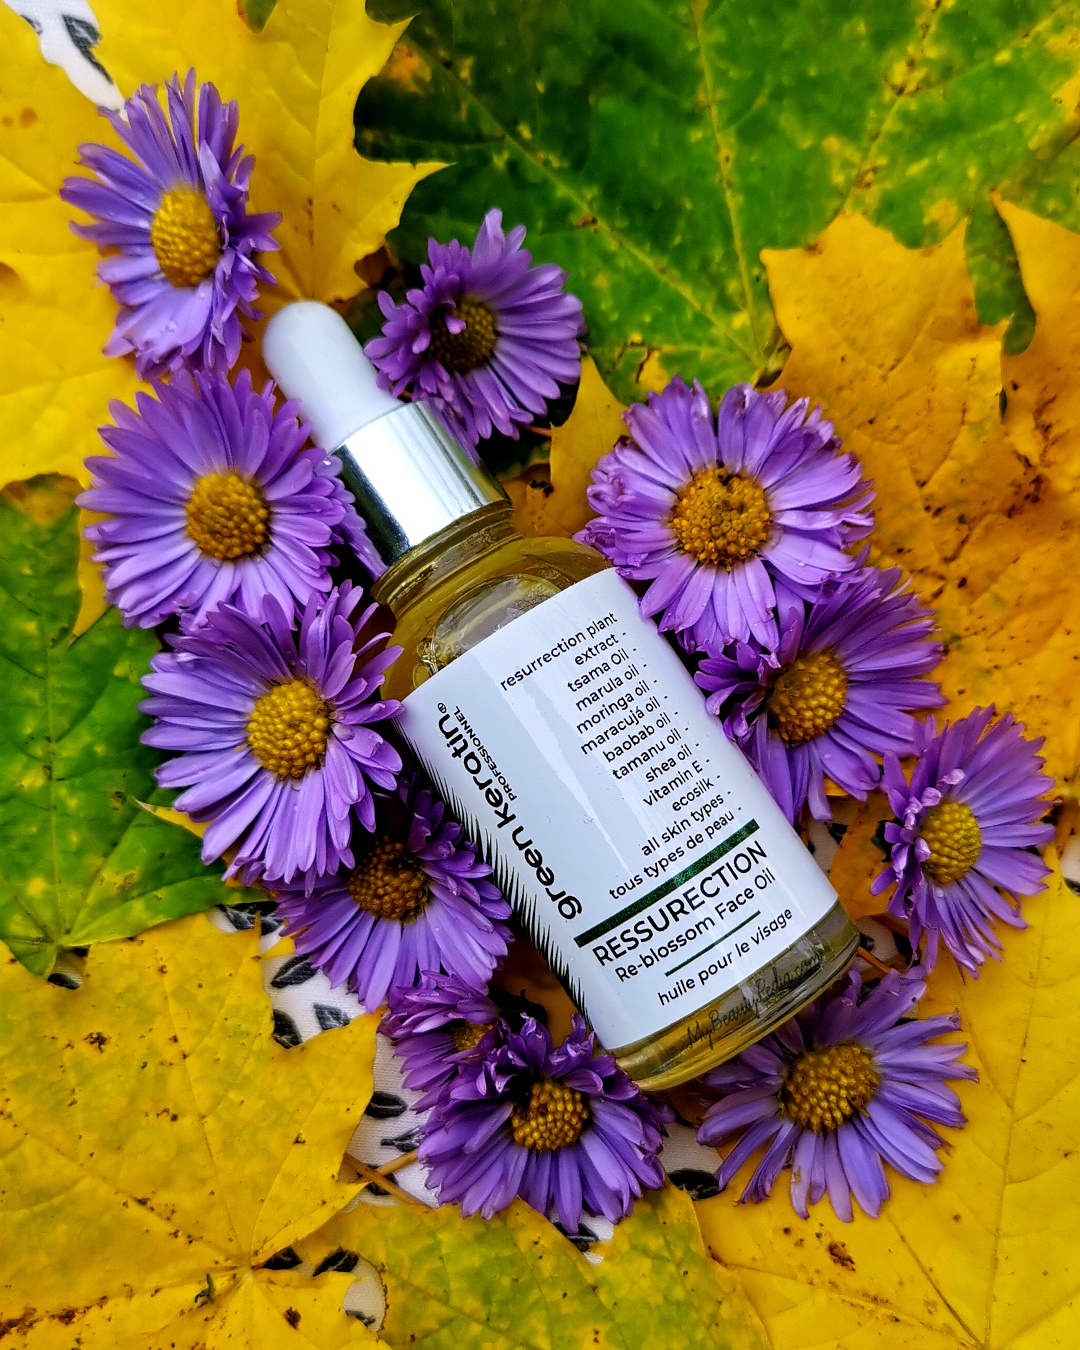 Green Keratin Resurrection Re-Blossom Face Oil